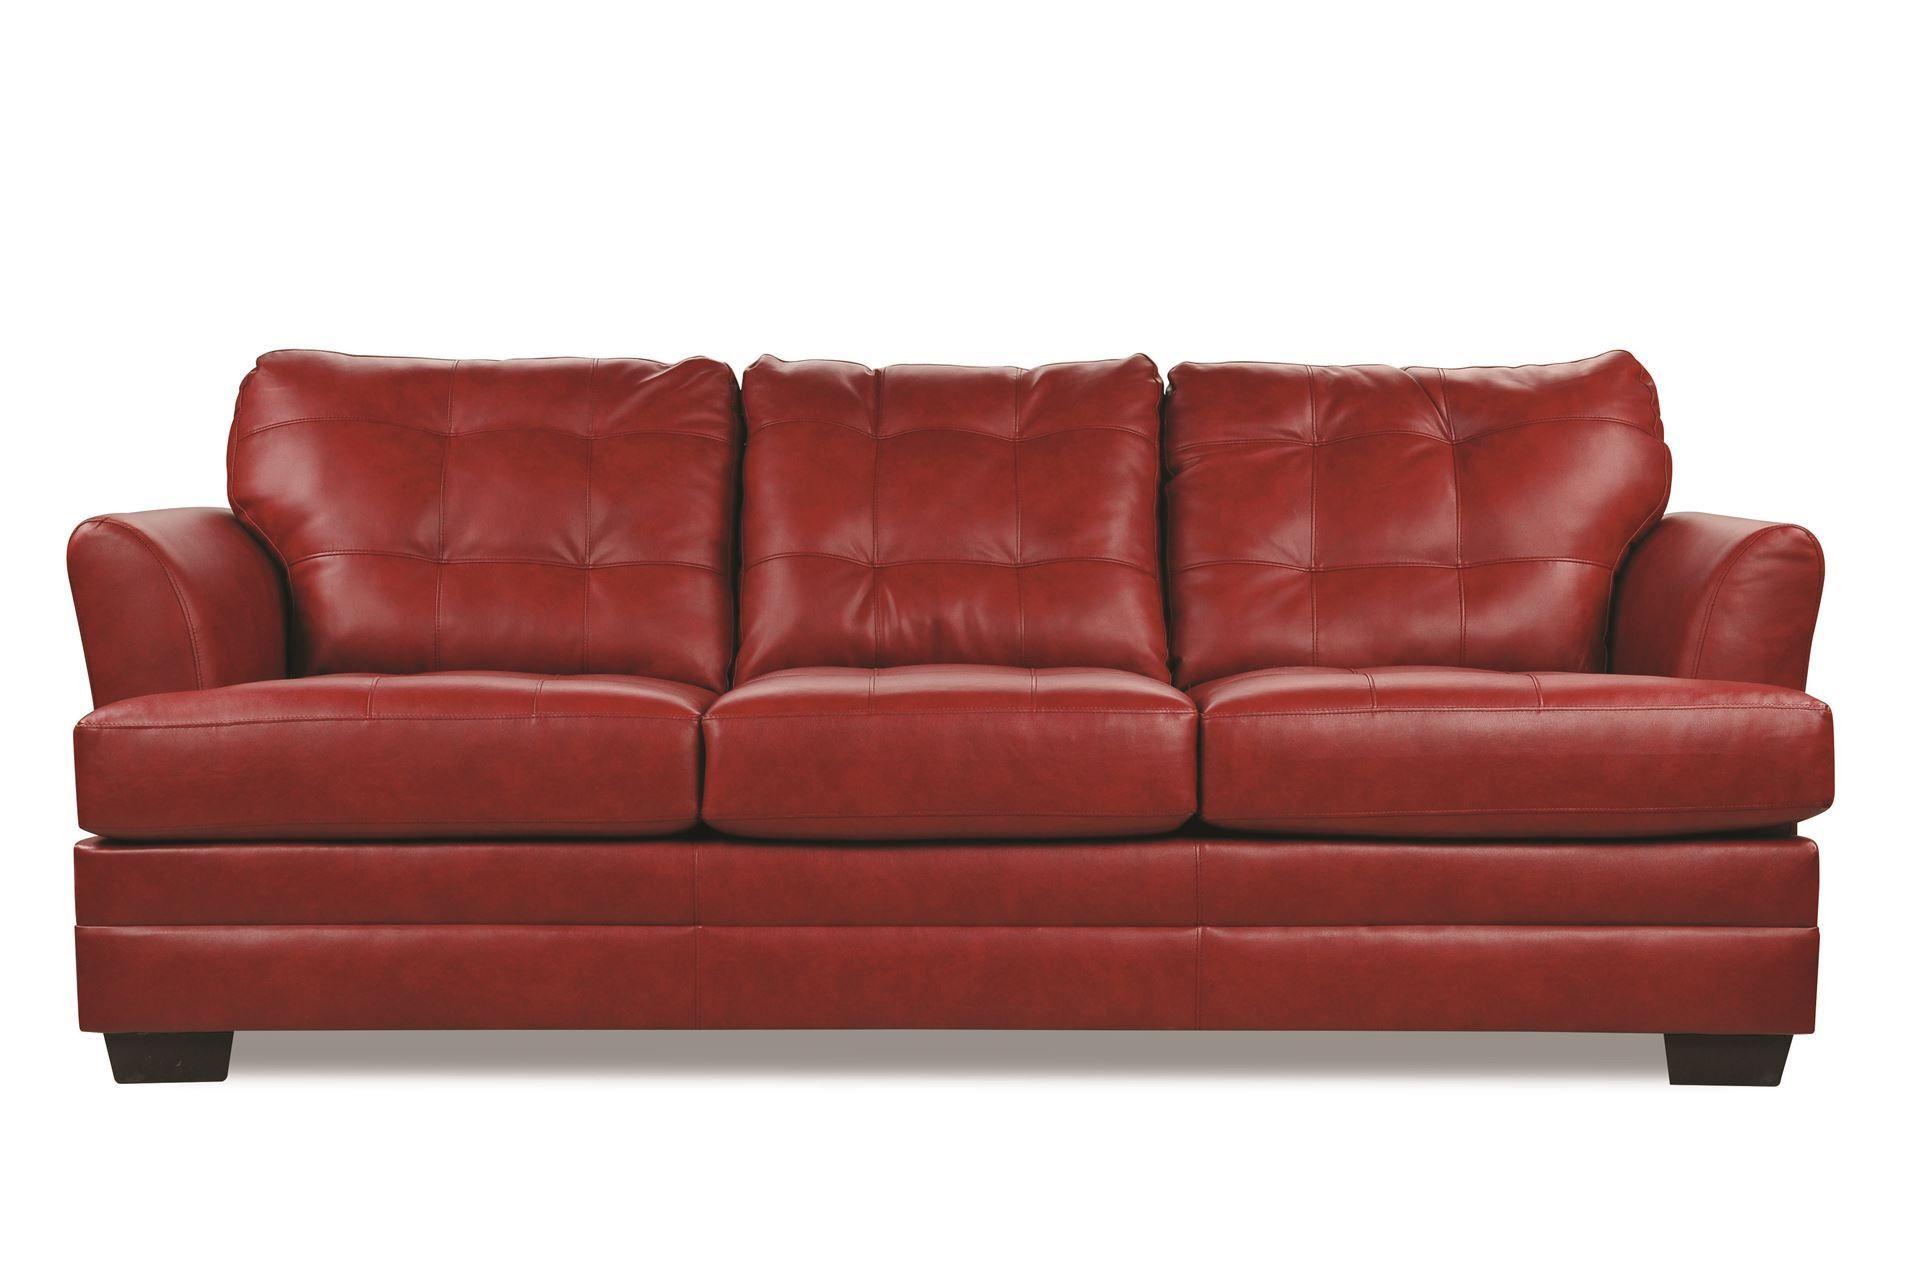 Avondale Cardinal Sofa